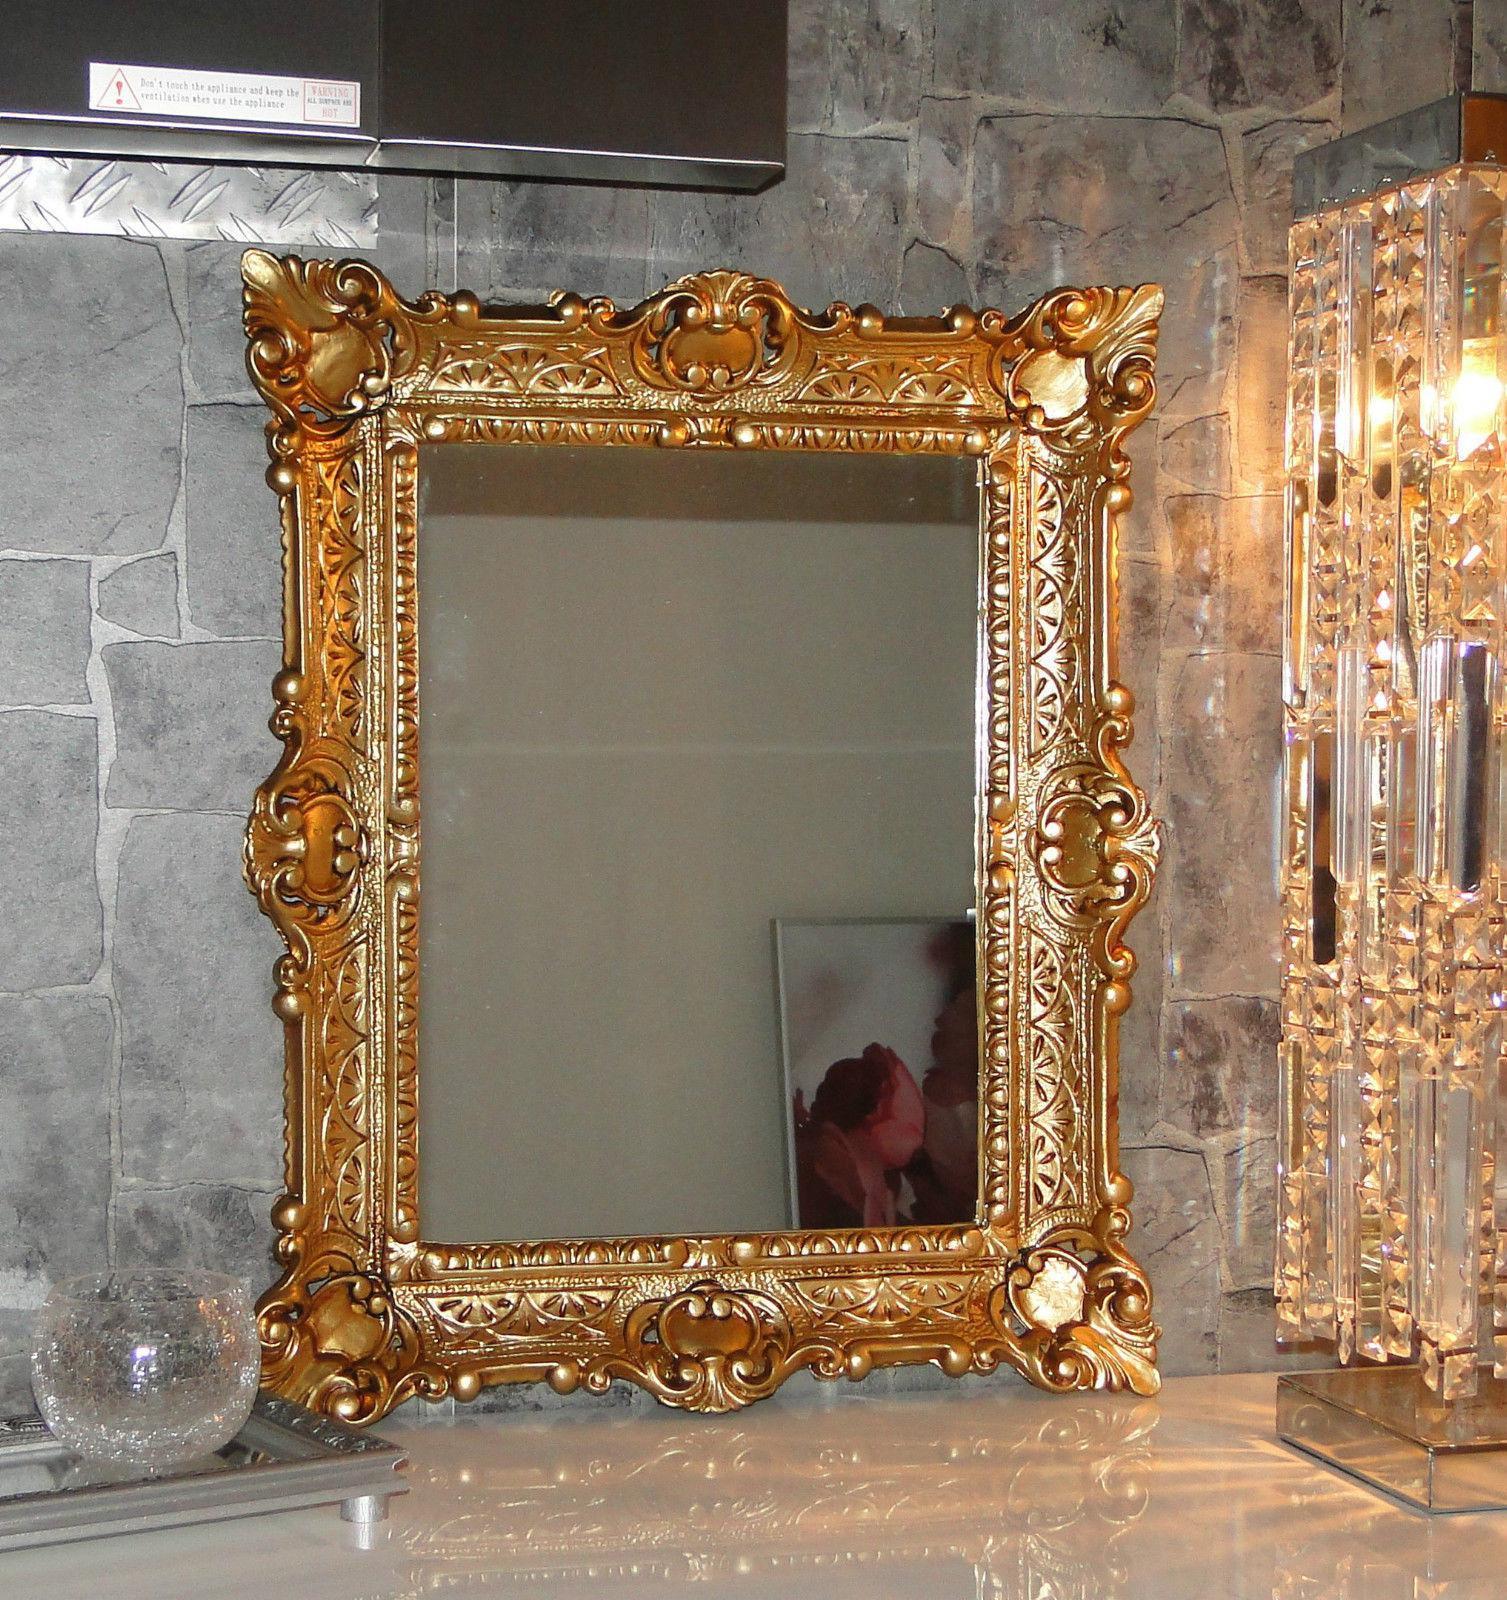 bilderrahmen gold barock 56x46 fotorahmen antik rahmen 30x40 mit glas kaufen bei pintici. Black Bedroom Furniture Sets. Home Design Ideas